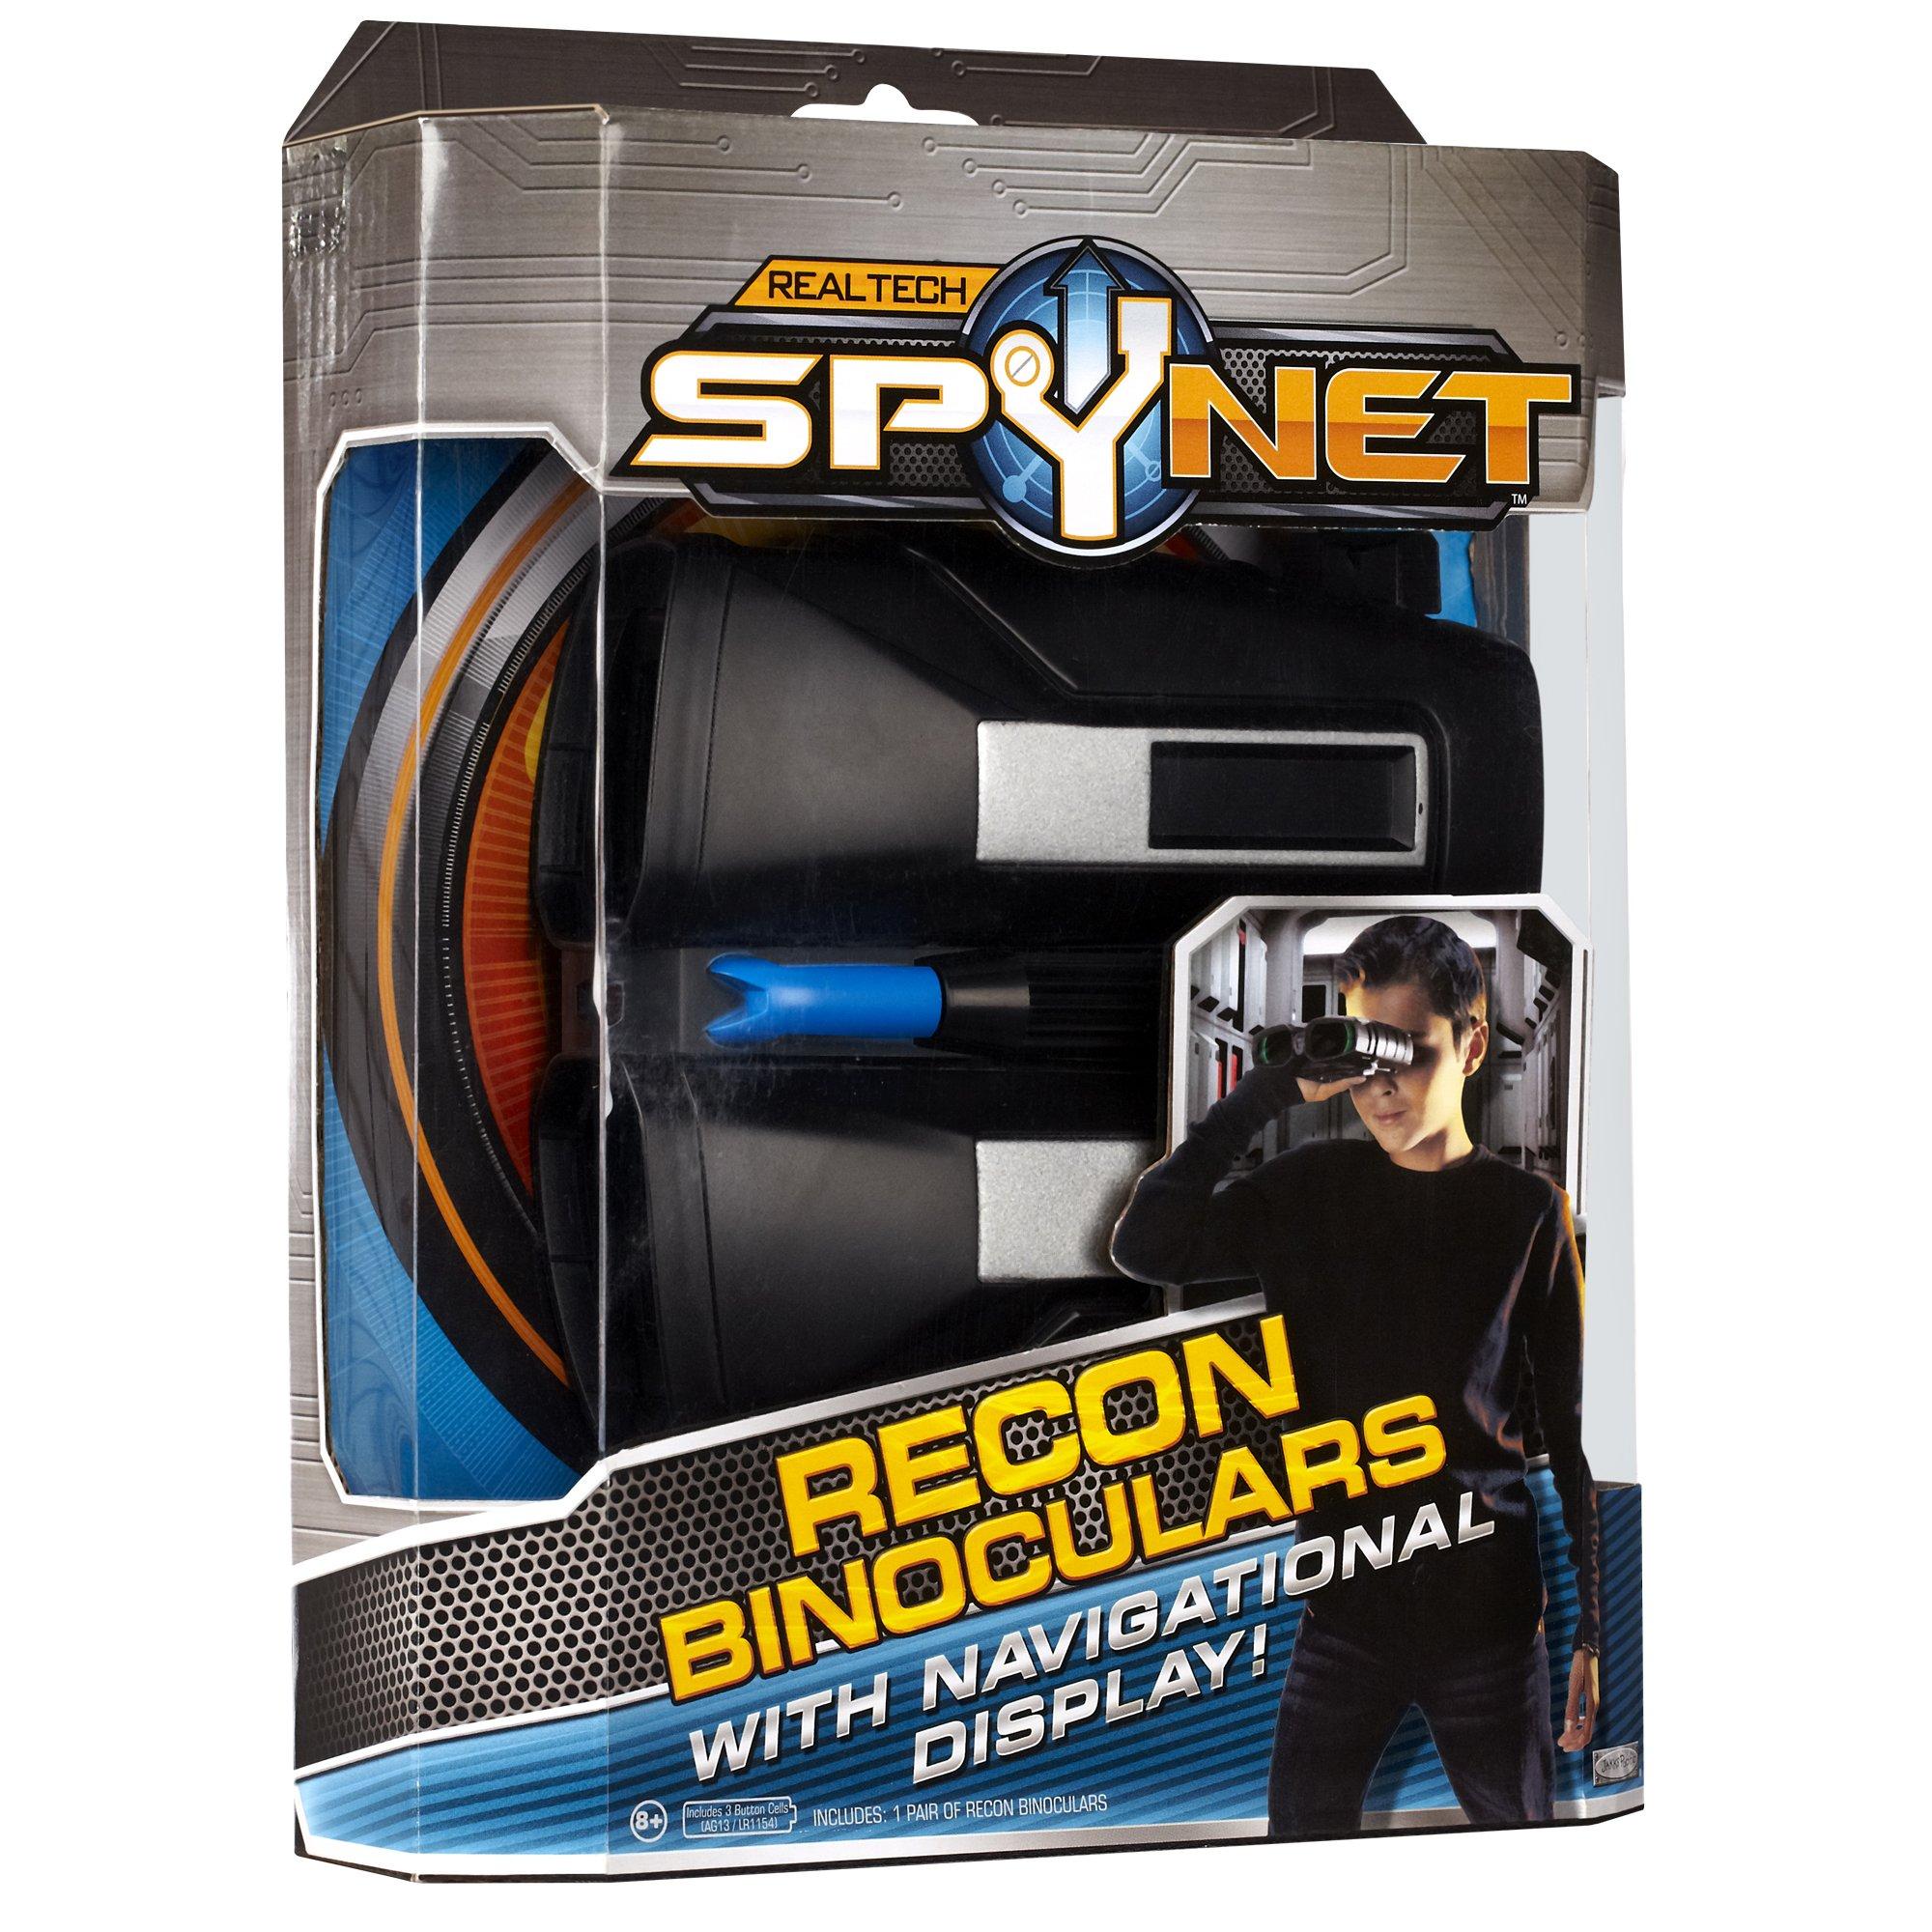 SpyNet Recon Binoculars